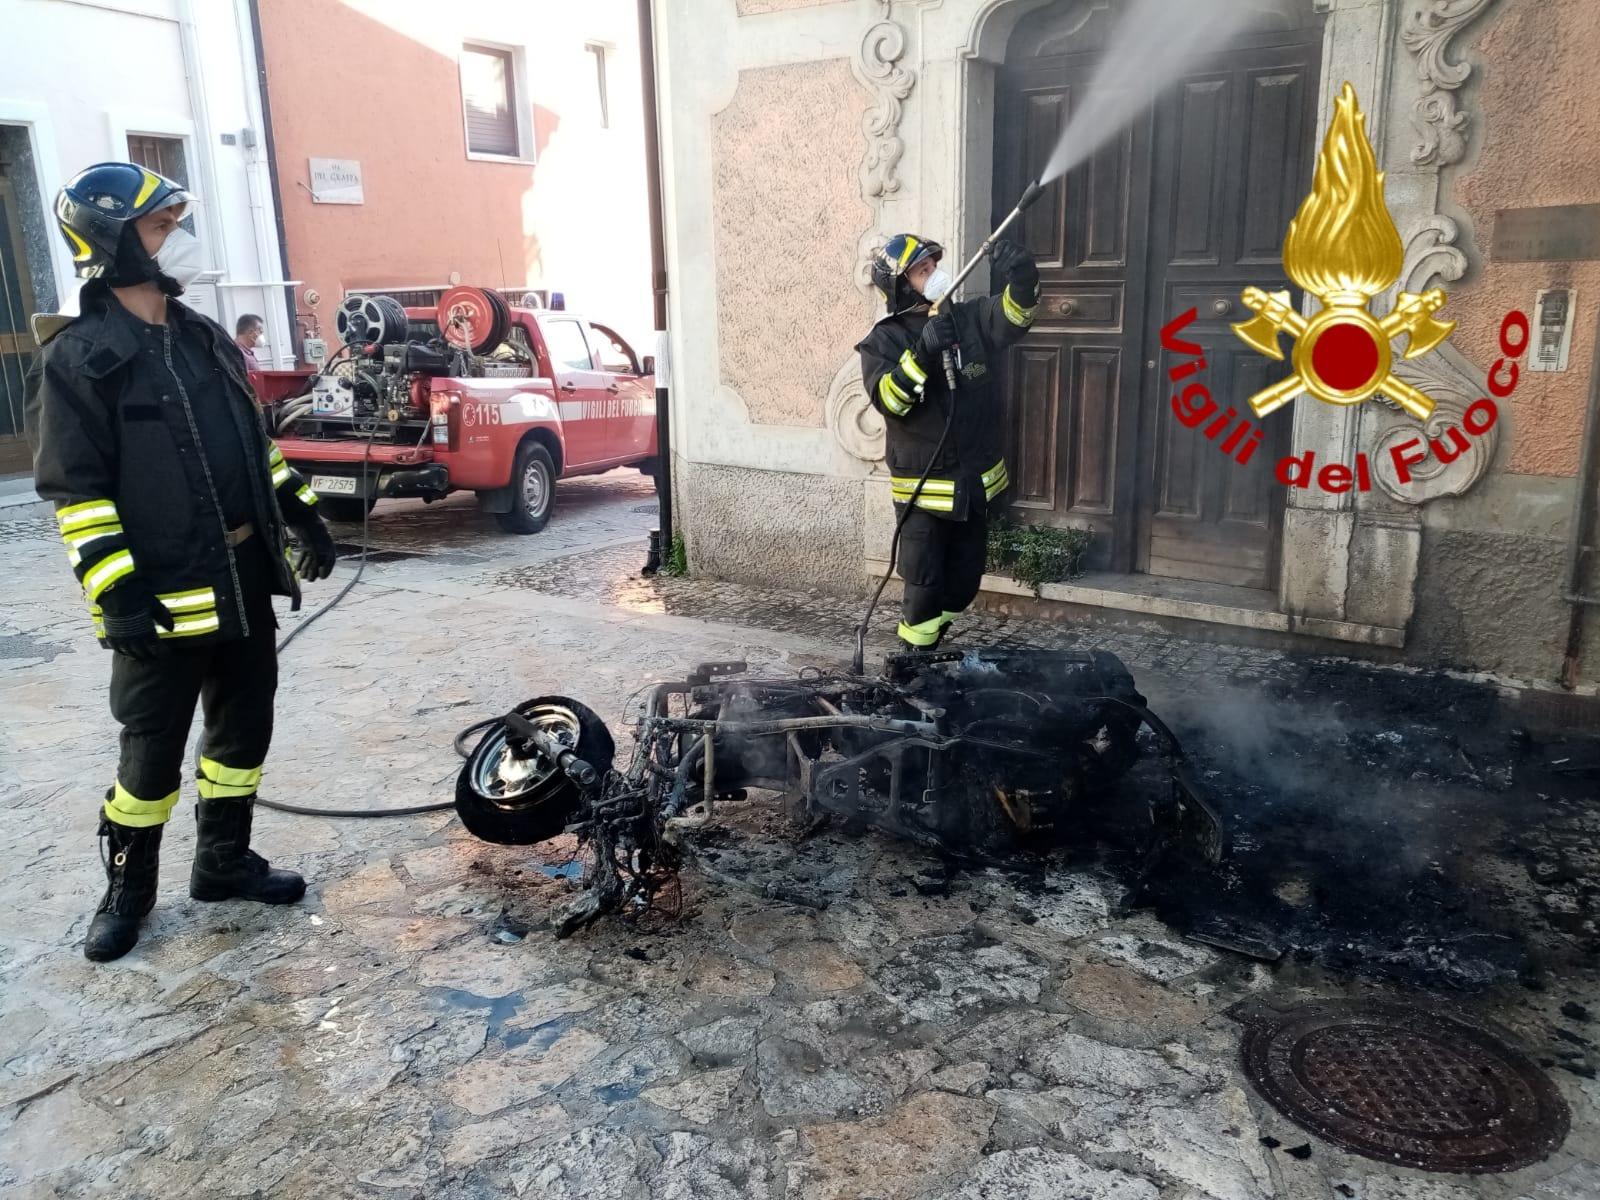 Scooter prende fuoco sotto casa, paura in paese